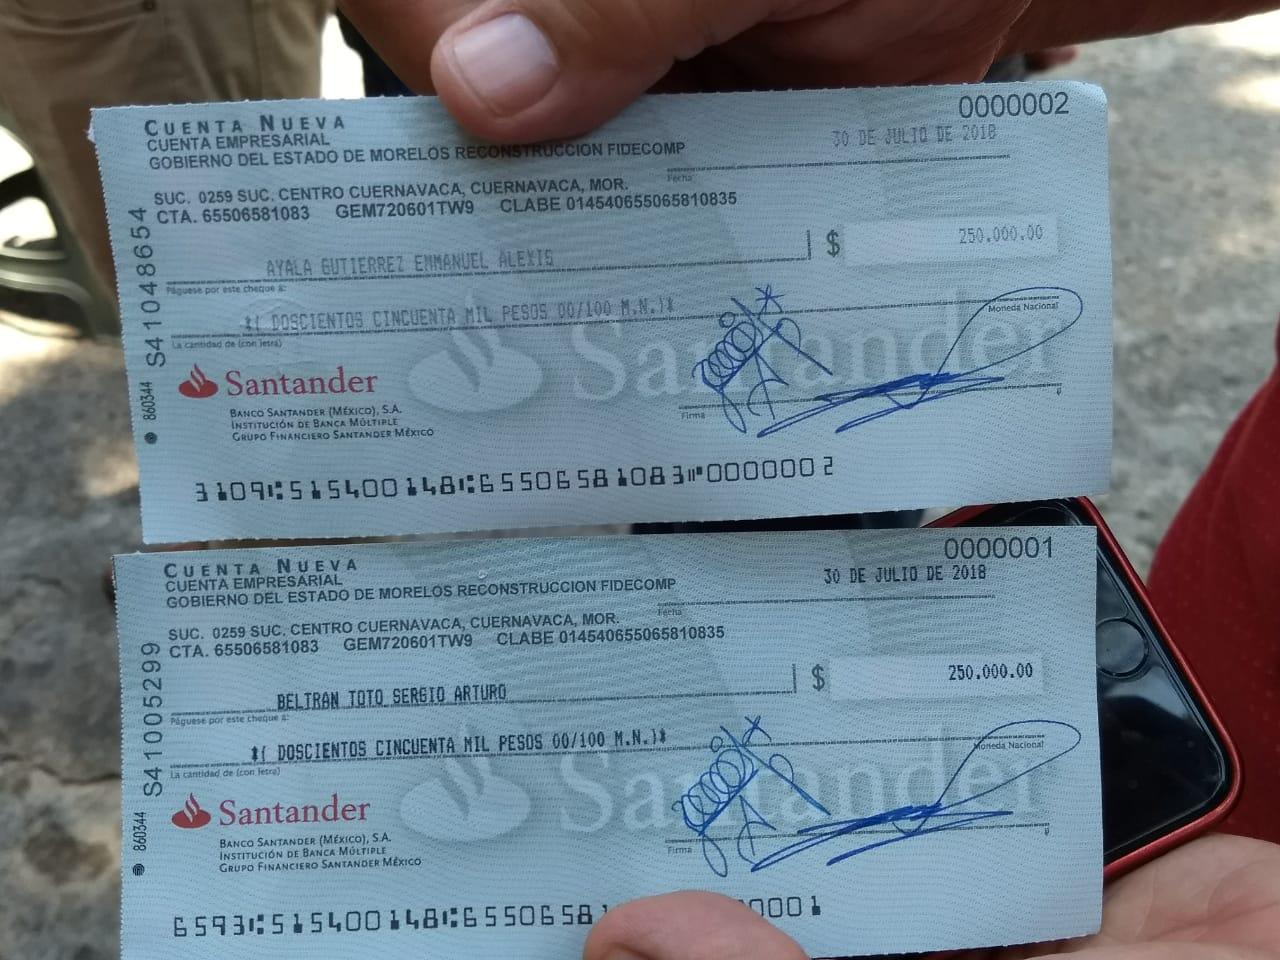 Aparecen Cheques A Nombre De Titulares Del Programa Unidos Por